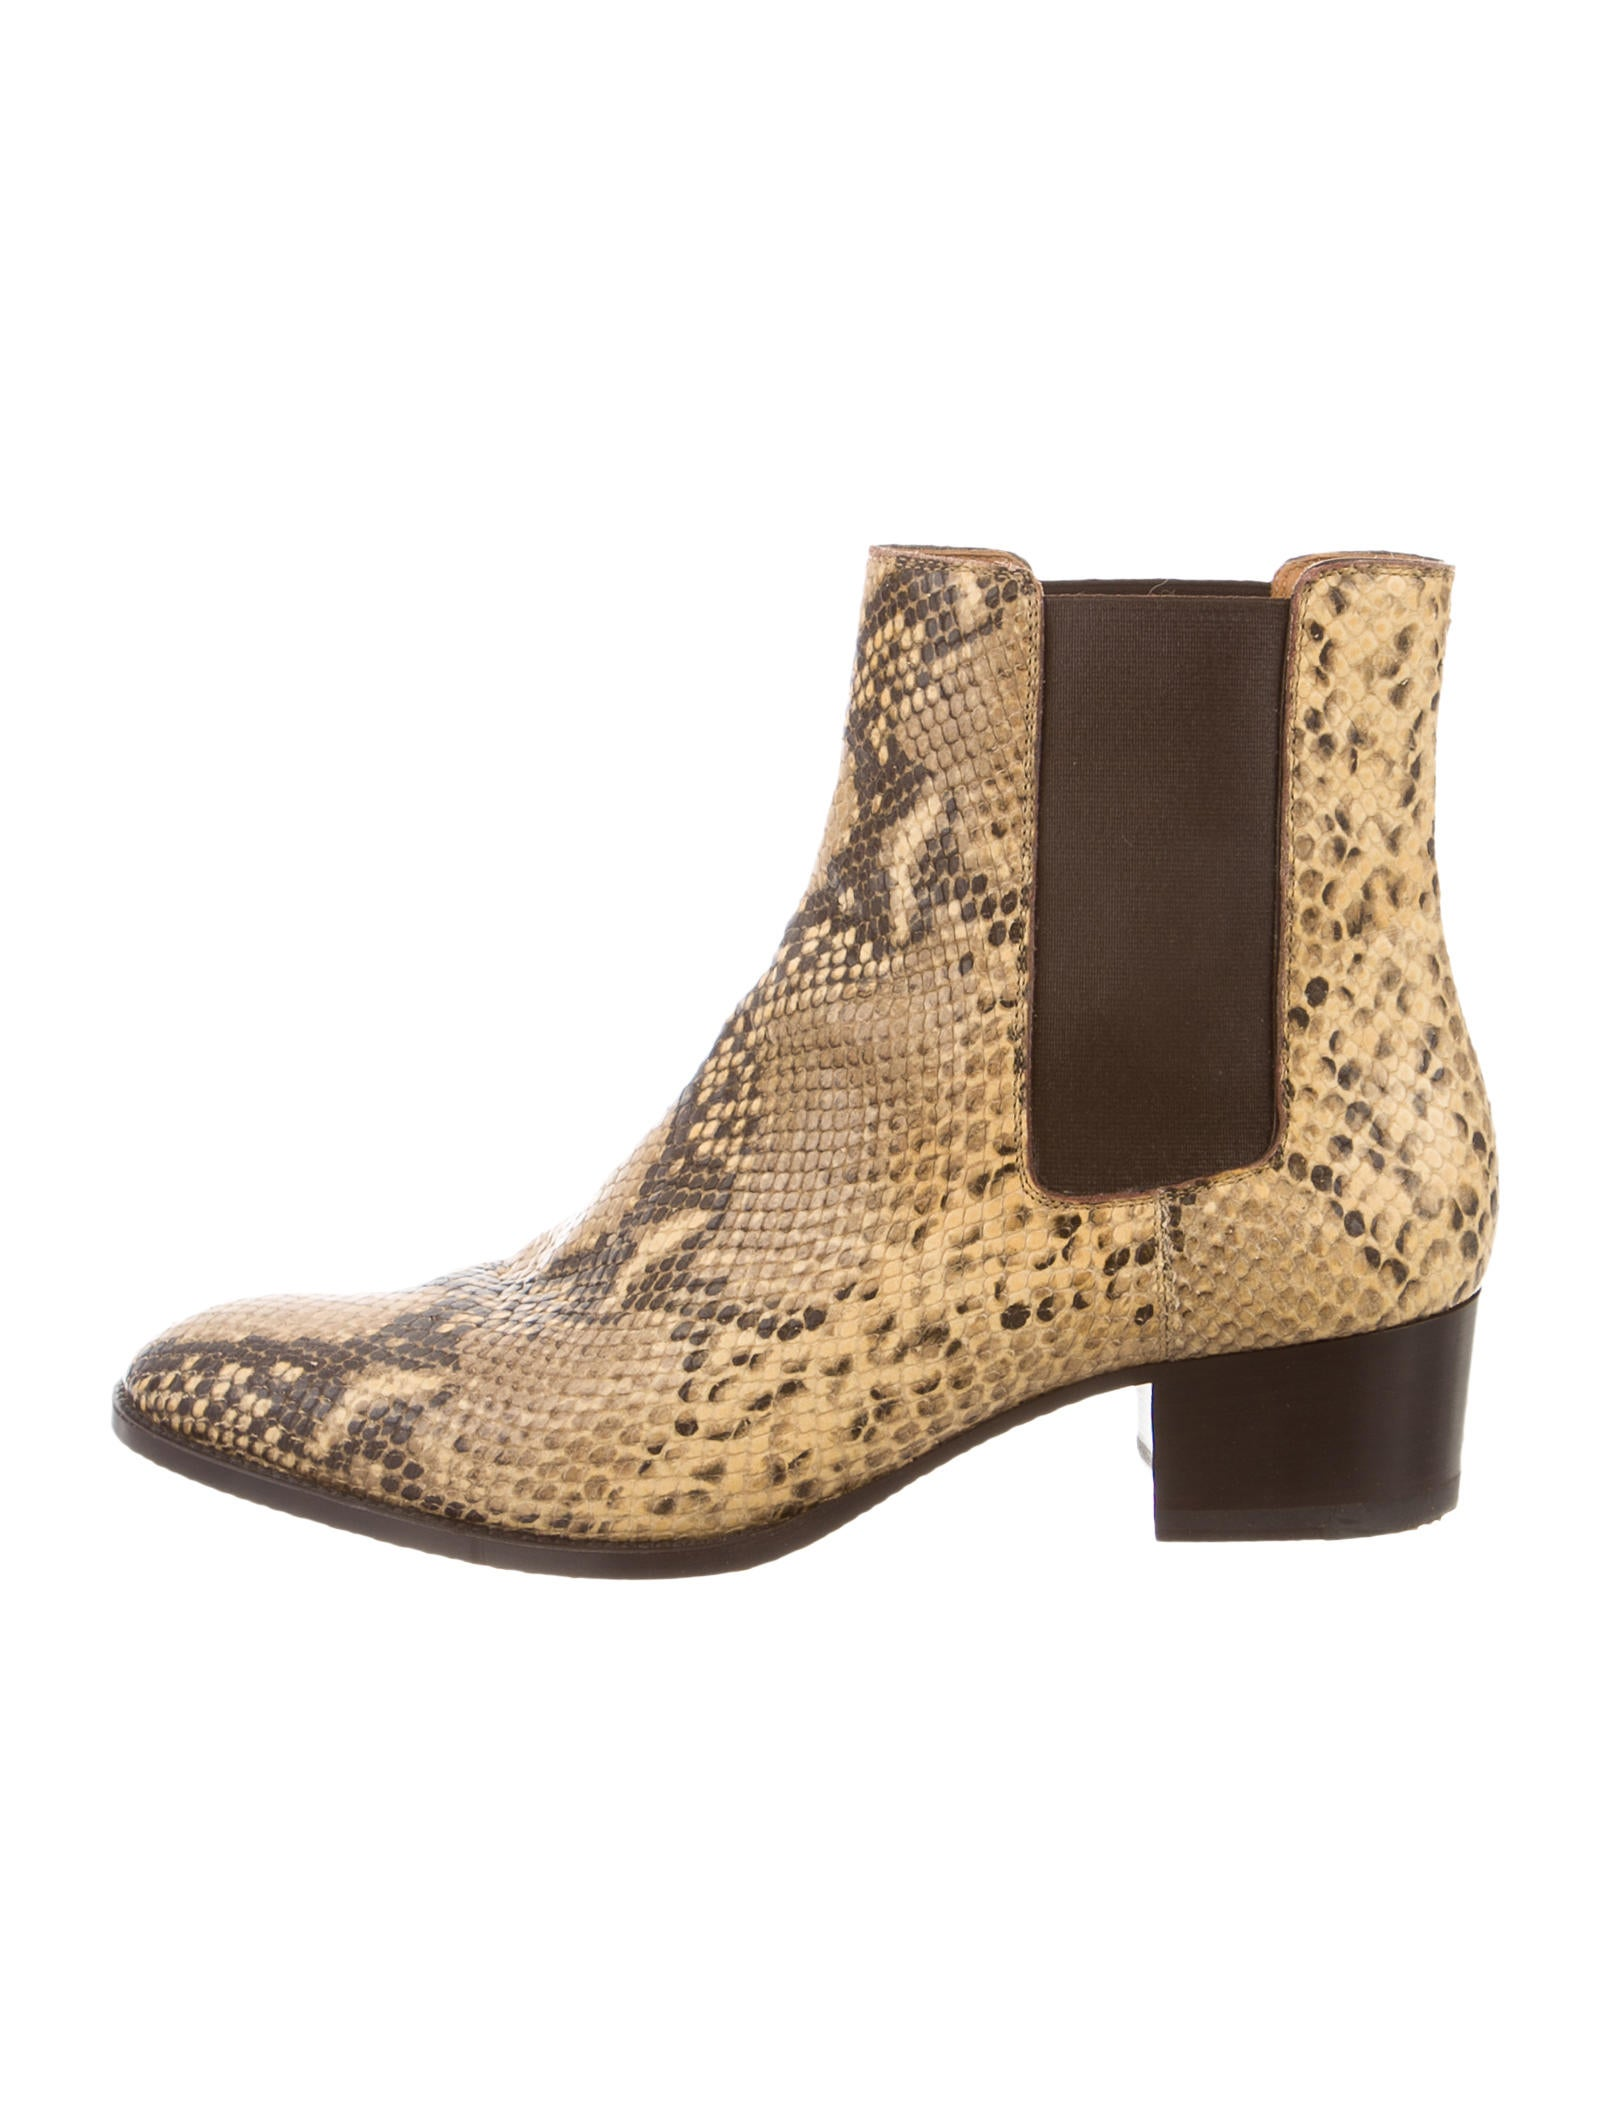 Contemporary Flatware Saint Laurent Snakeskin Round Toe Booties Shoes